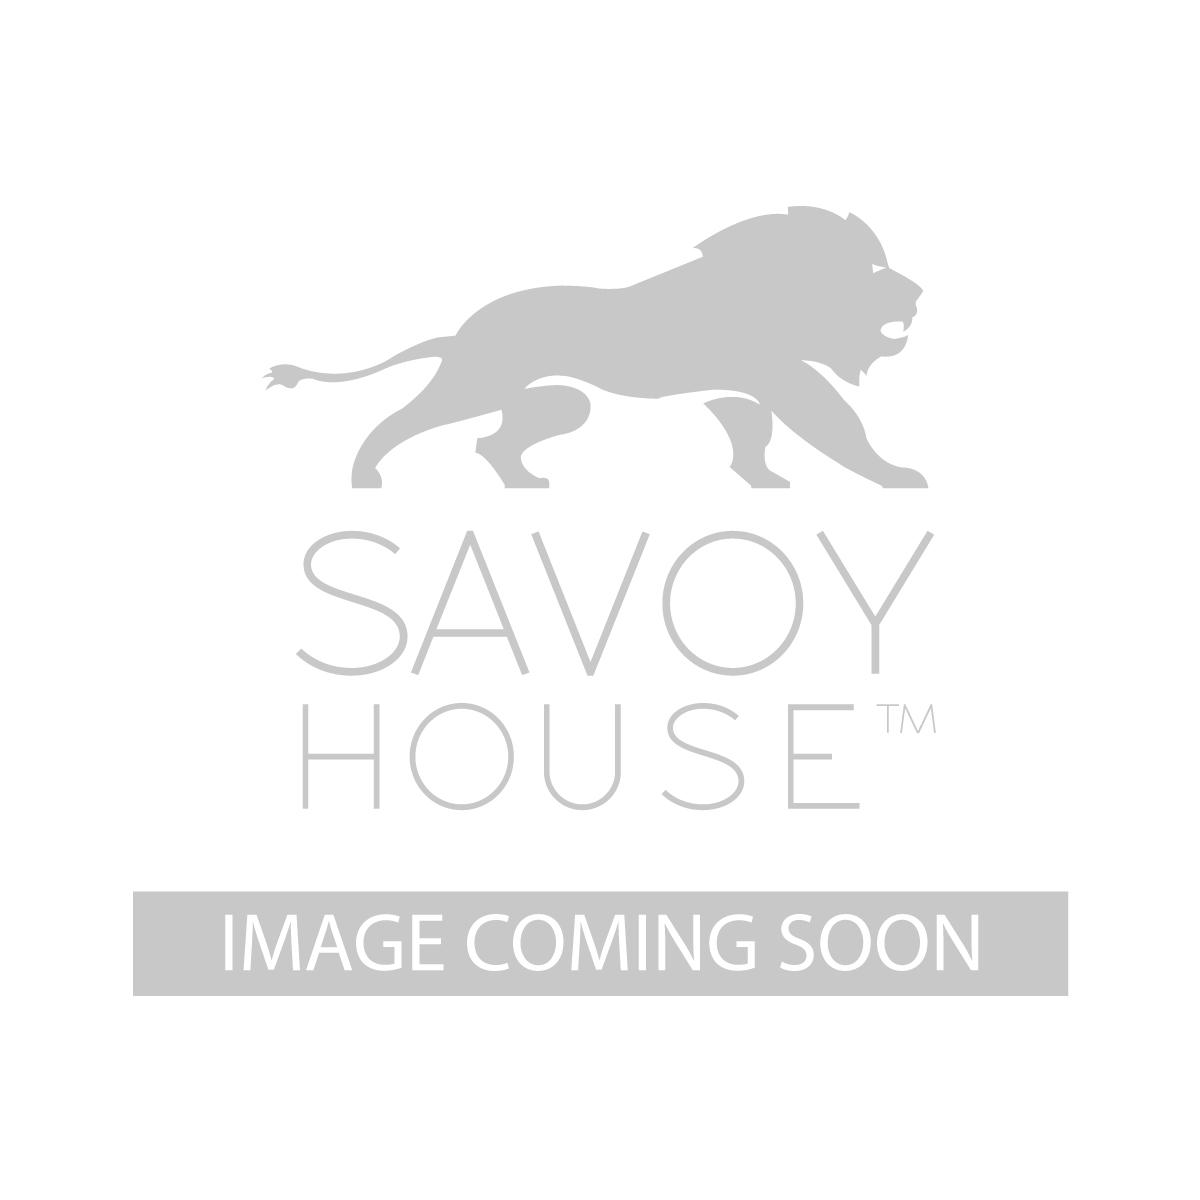 7 9006 3 322 Akron 3 Light Pendant By Savoy House